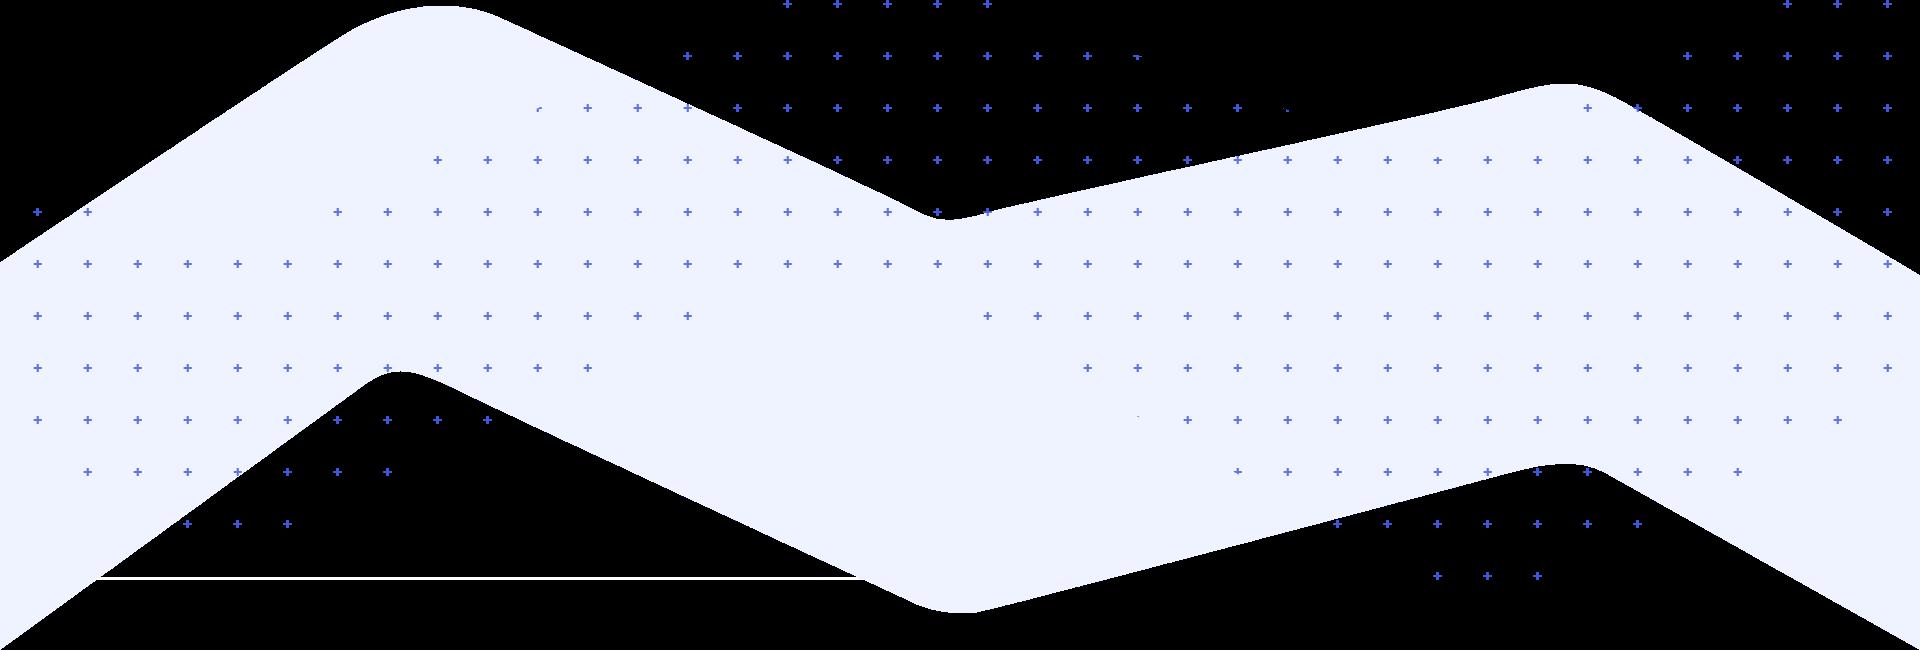 curves-stars